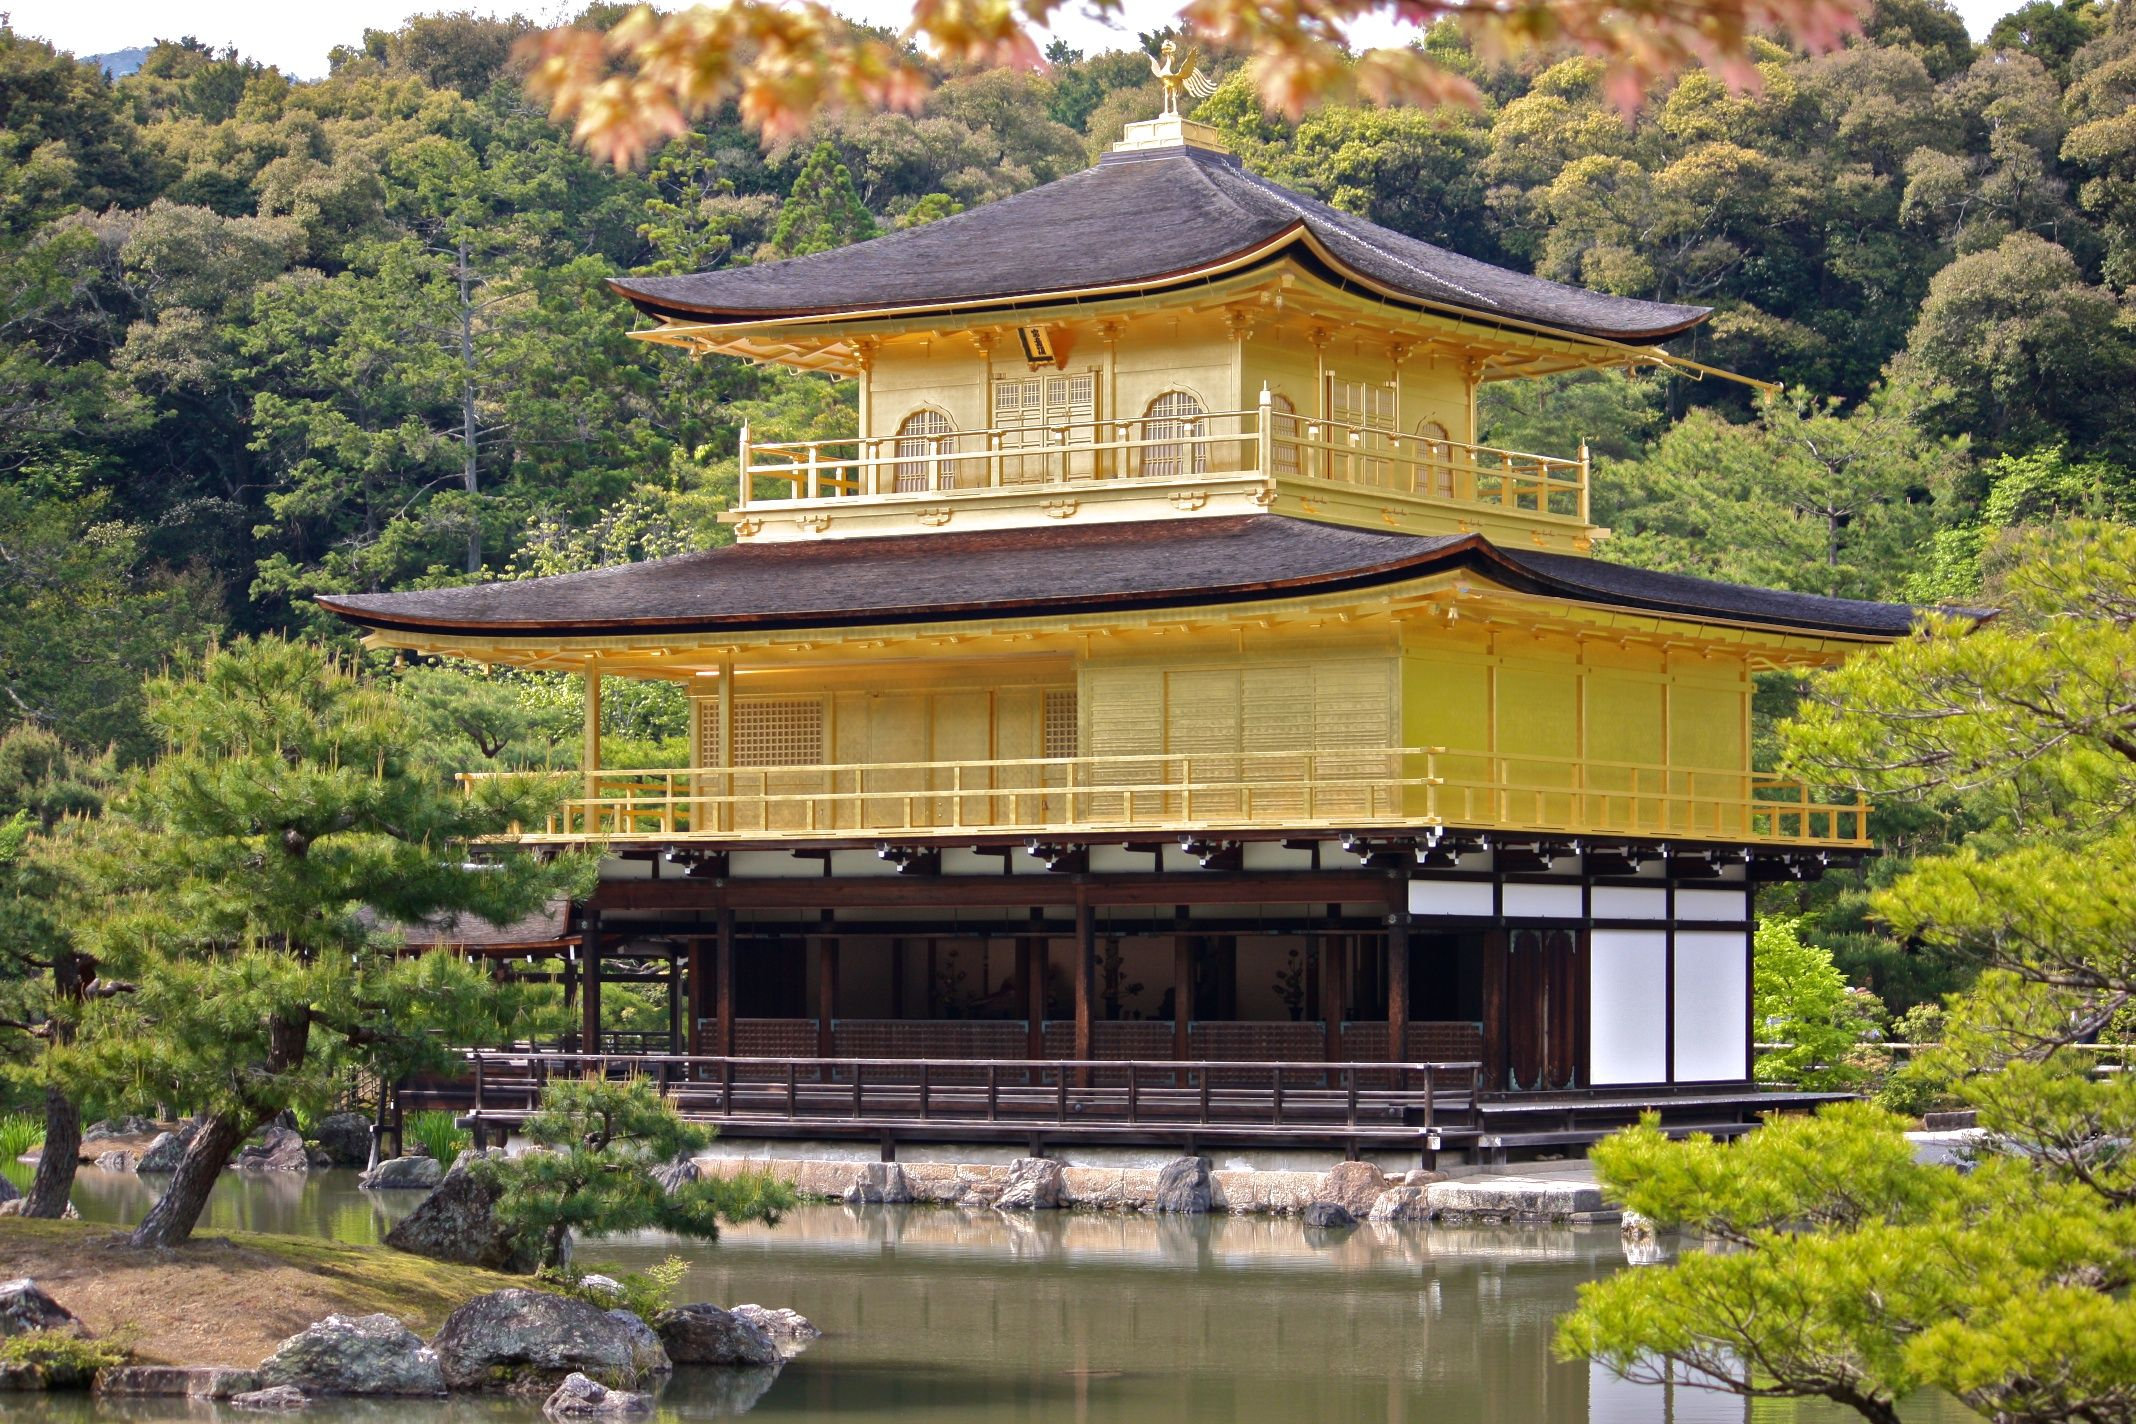 Kinkakuji (Golden Pavilion), Kyoto, Japan, 1394